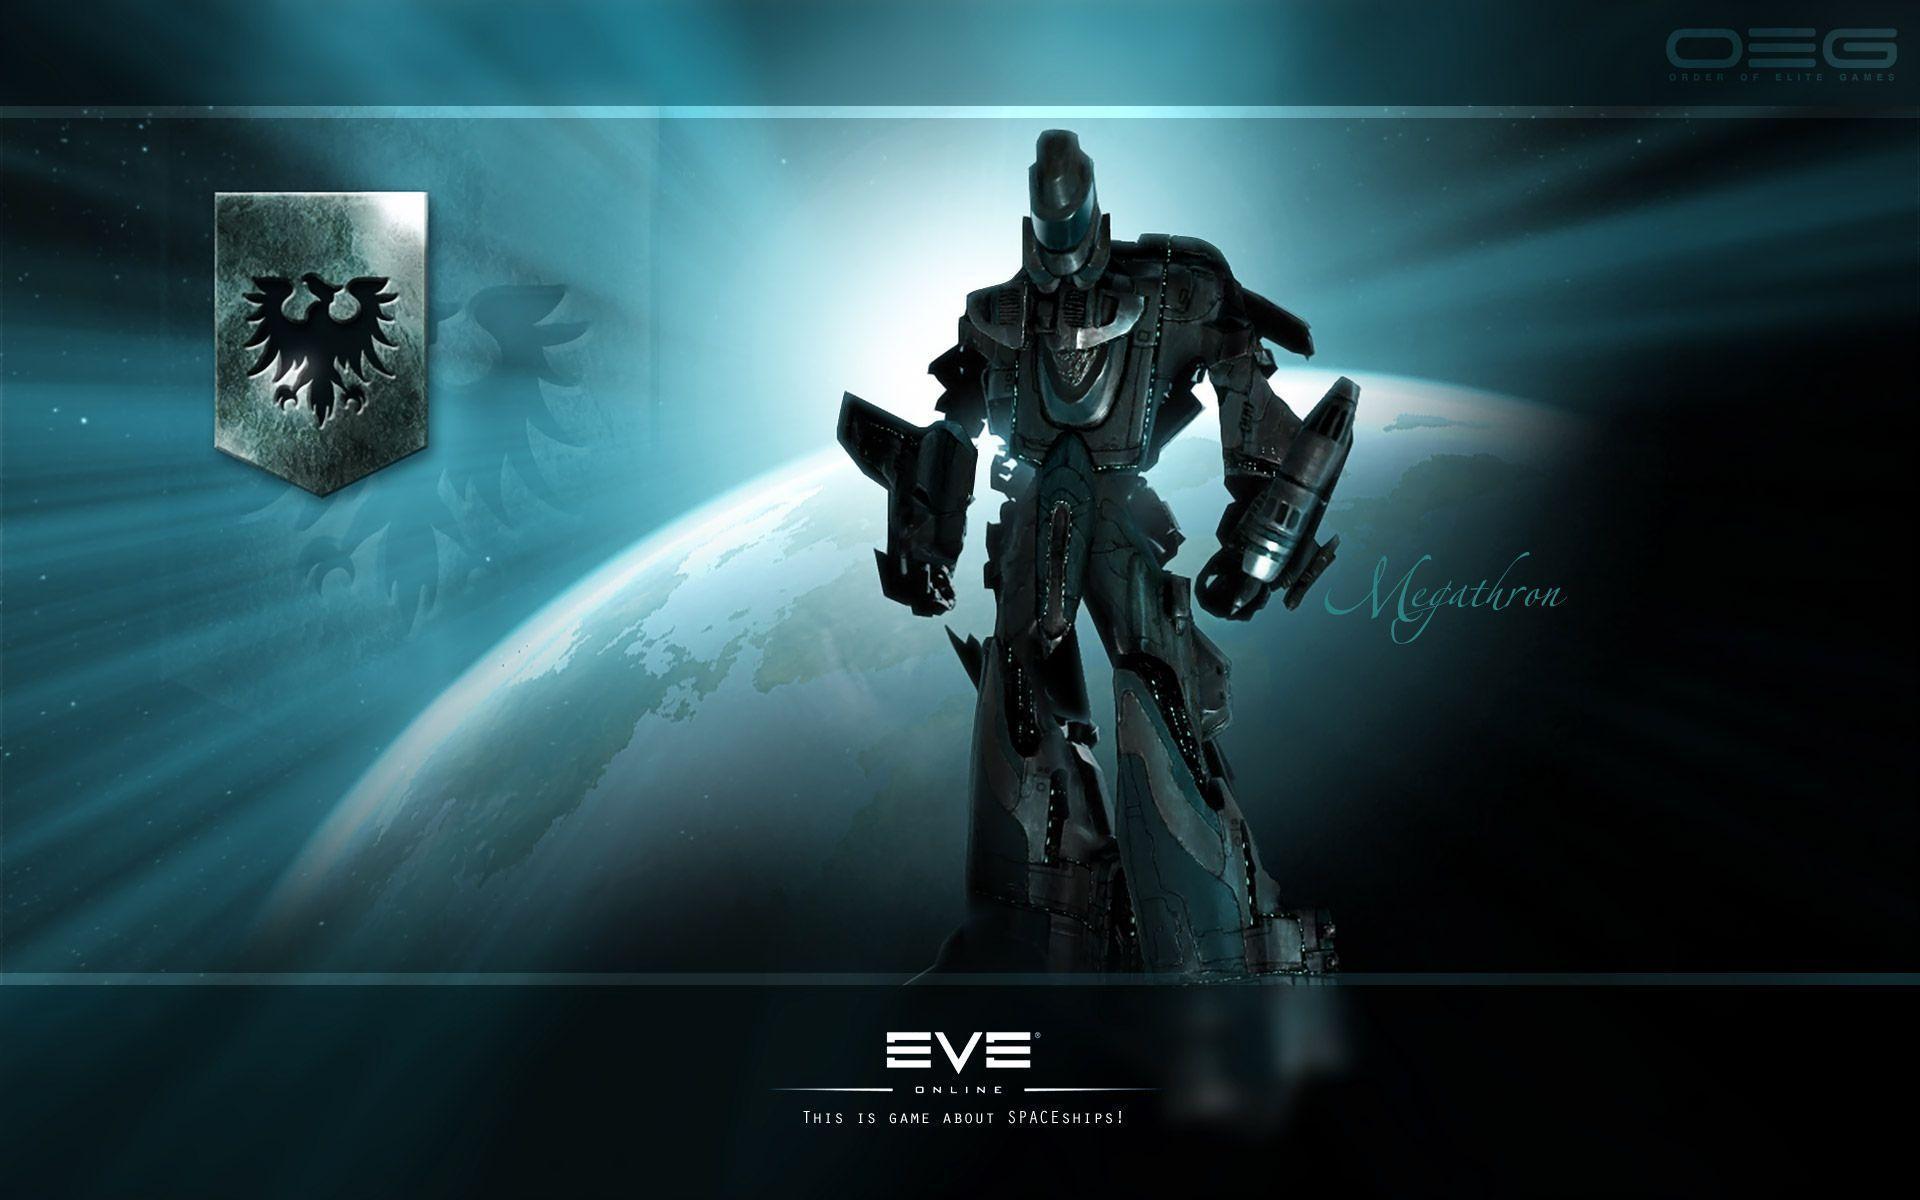 Eve Online Backgrounds   Wallpaper Cave